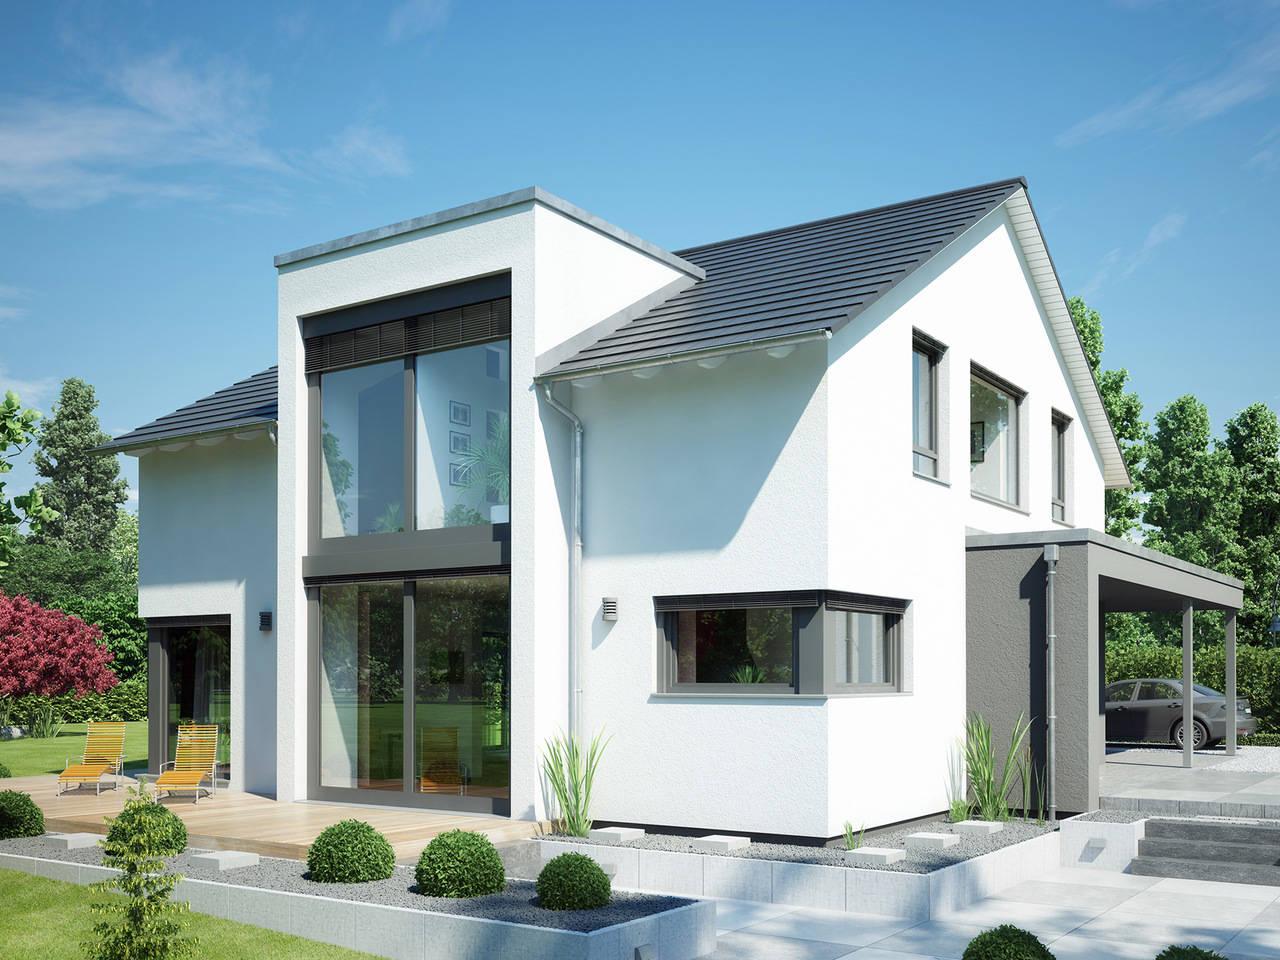 Concept-M Köln Mod-Classic - Architektenhaus Variante A